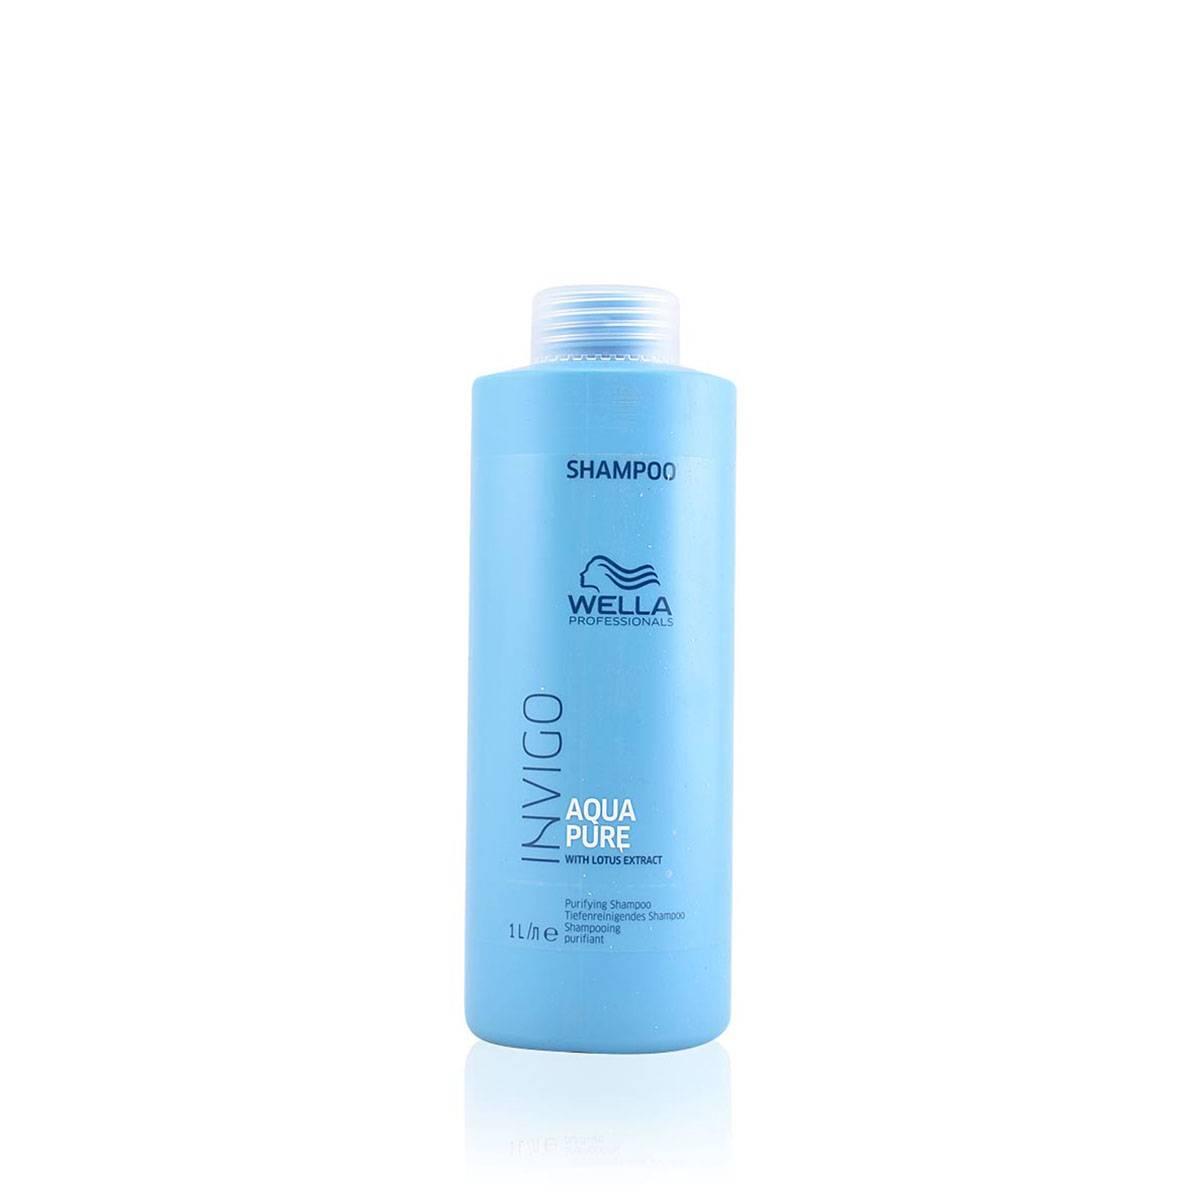 Pure shampoo multivitaminic 1000 ml PUREZZA/FORFORA